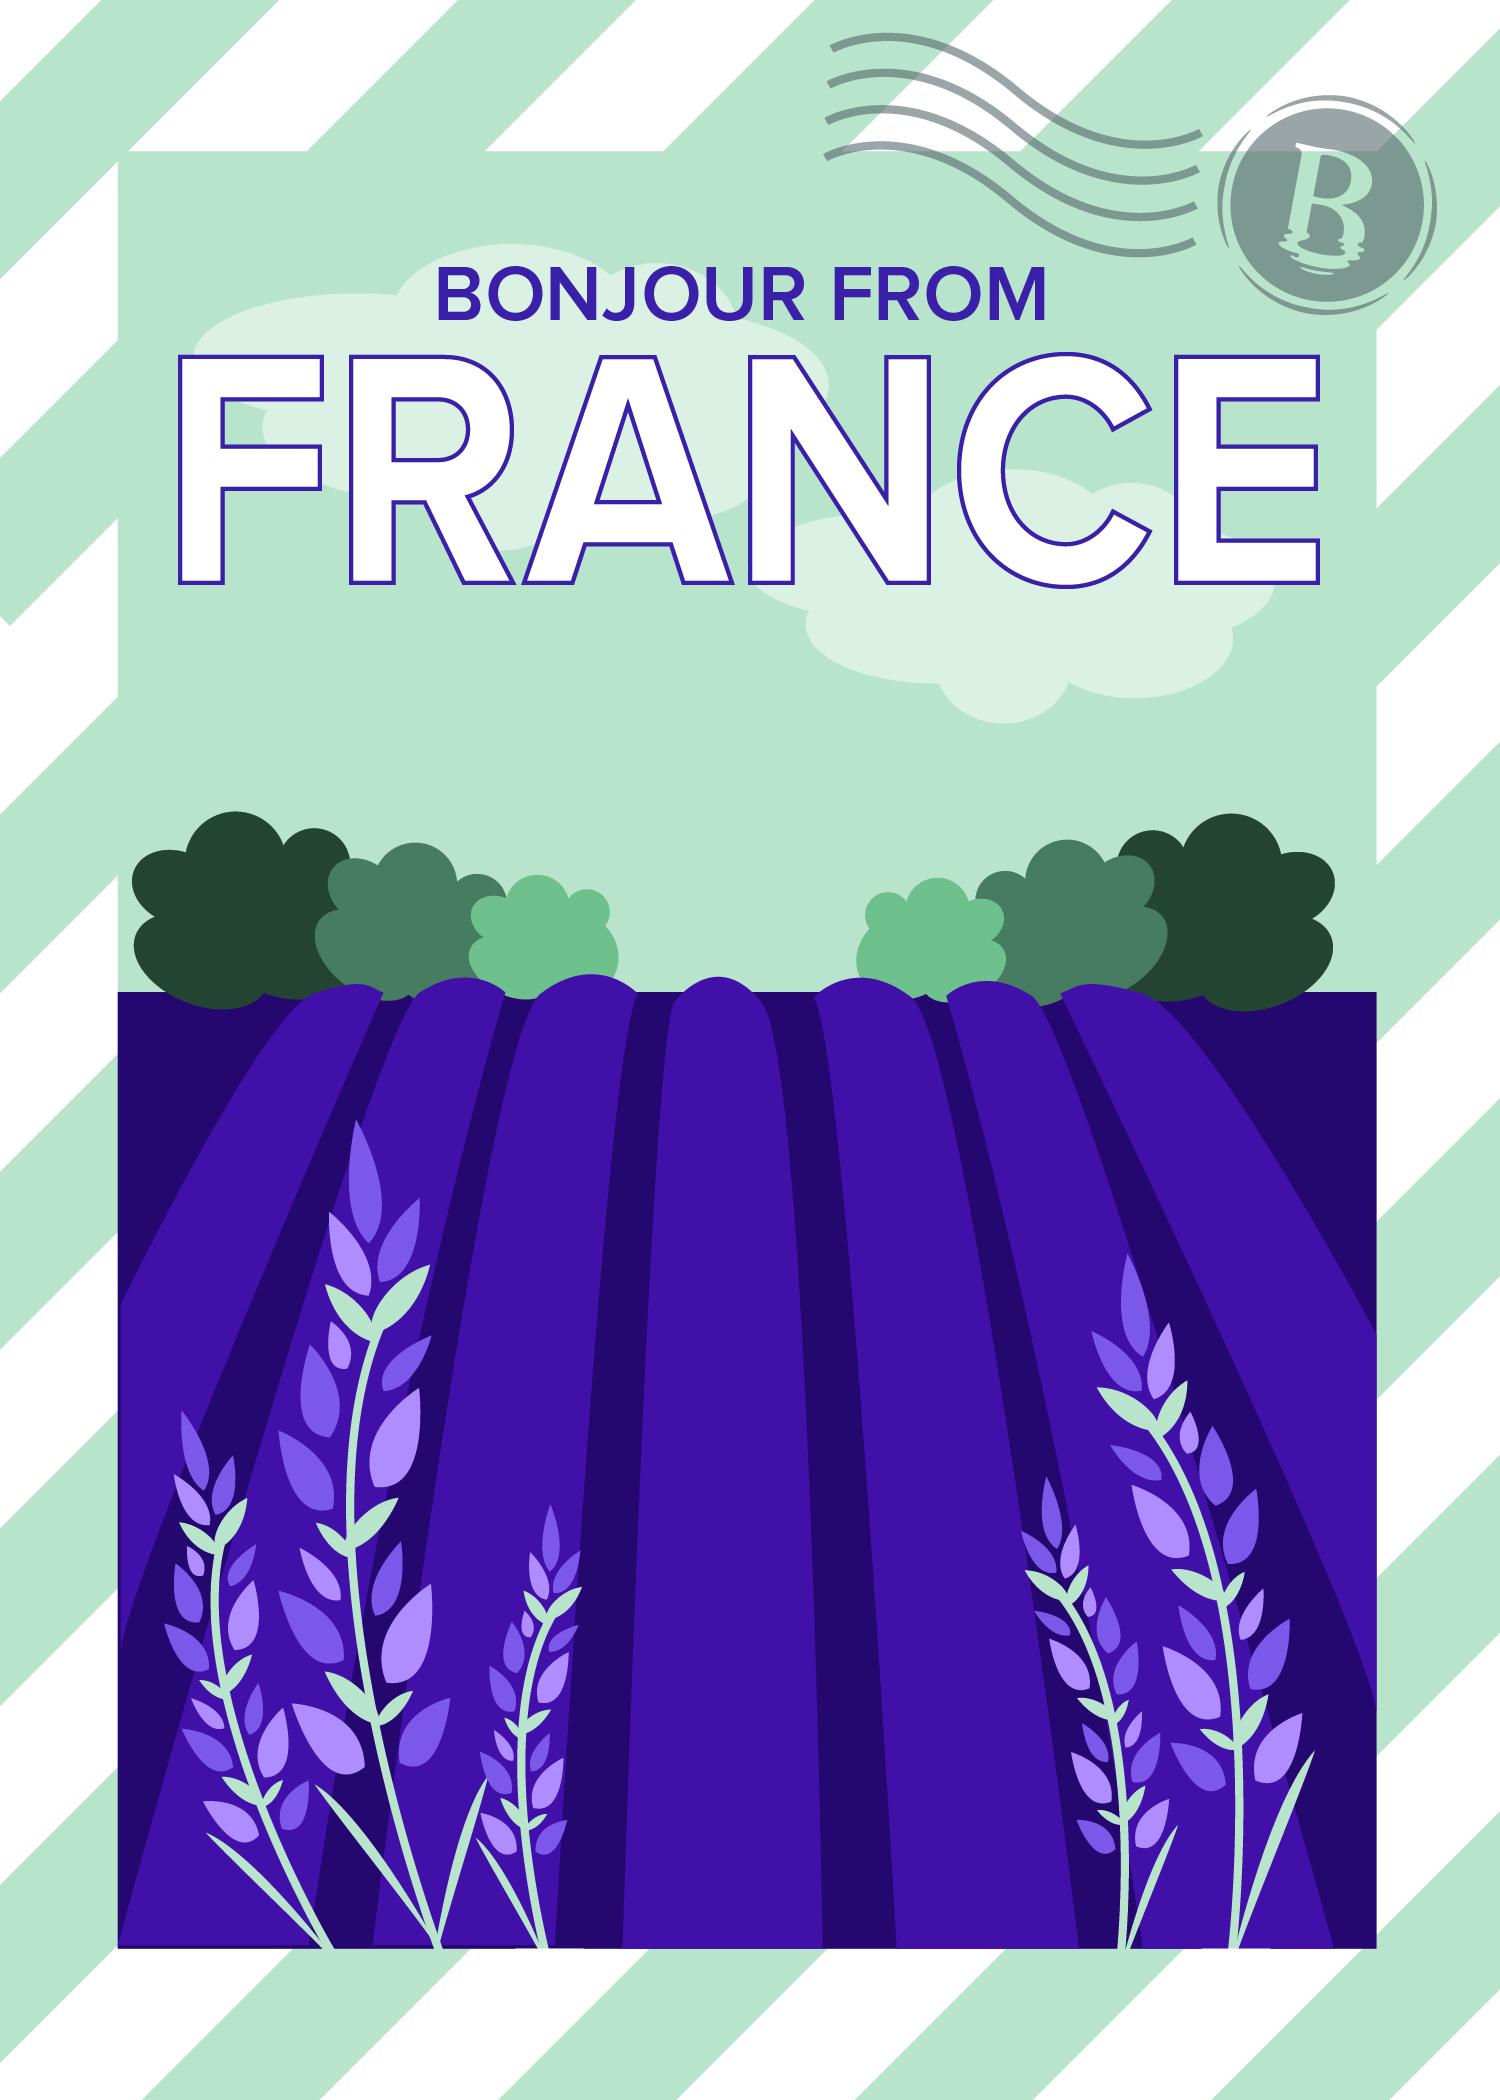 FrancePostcard